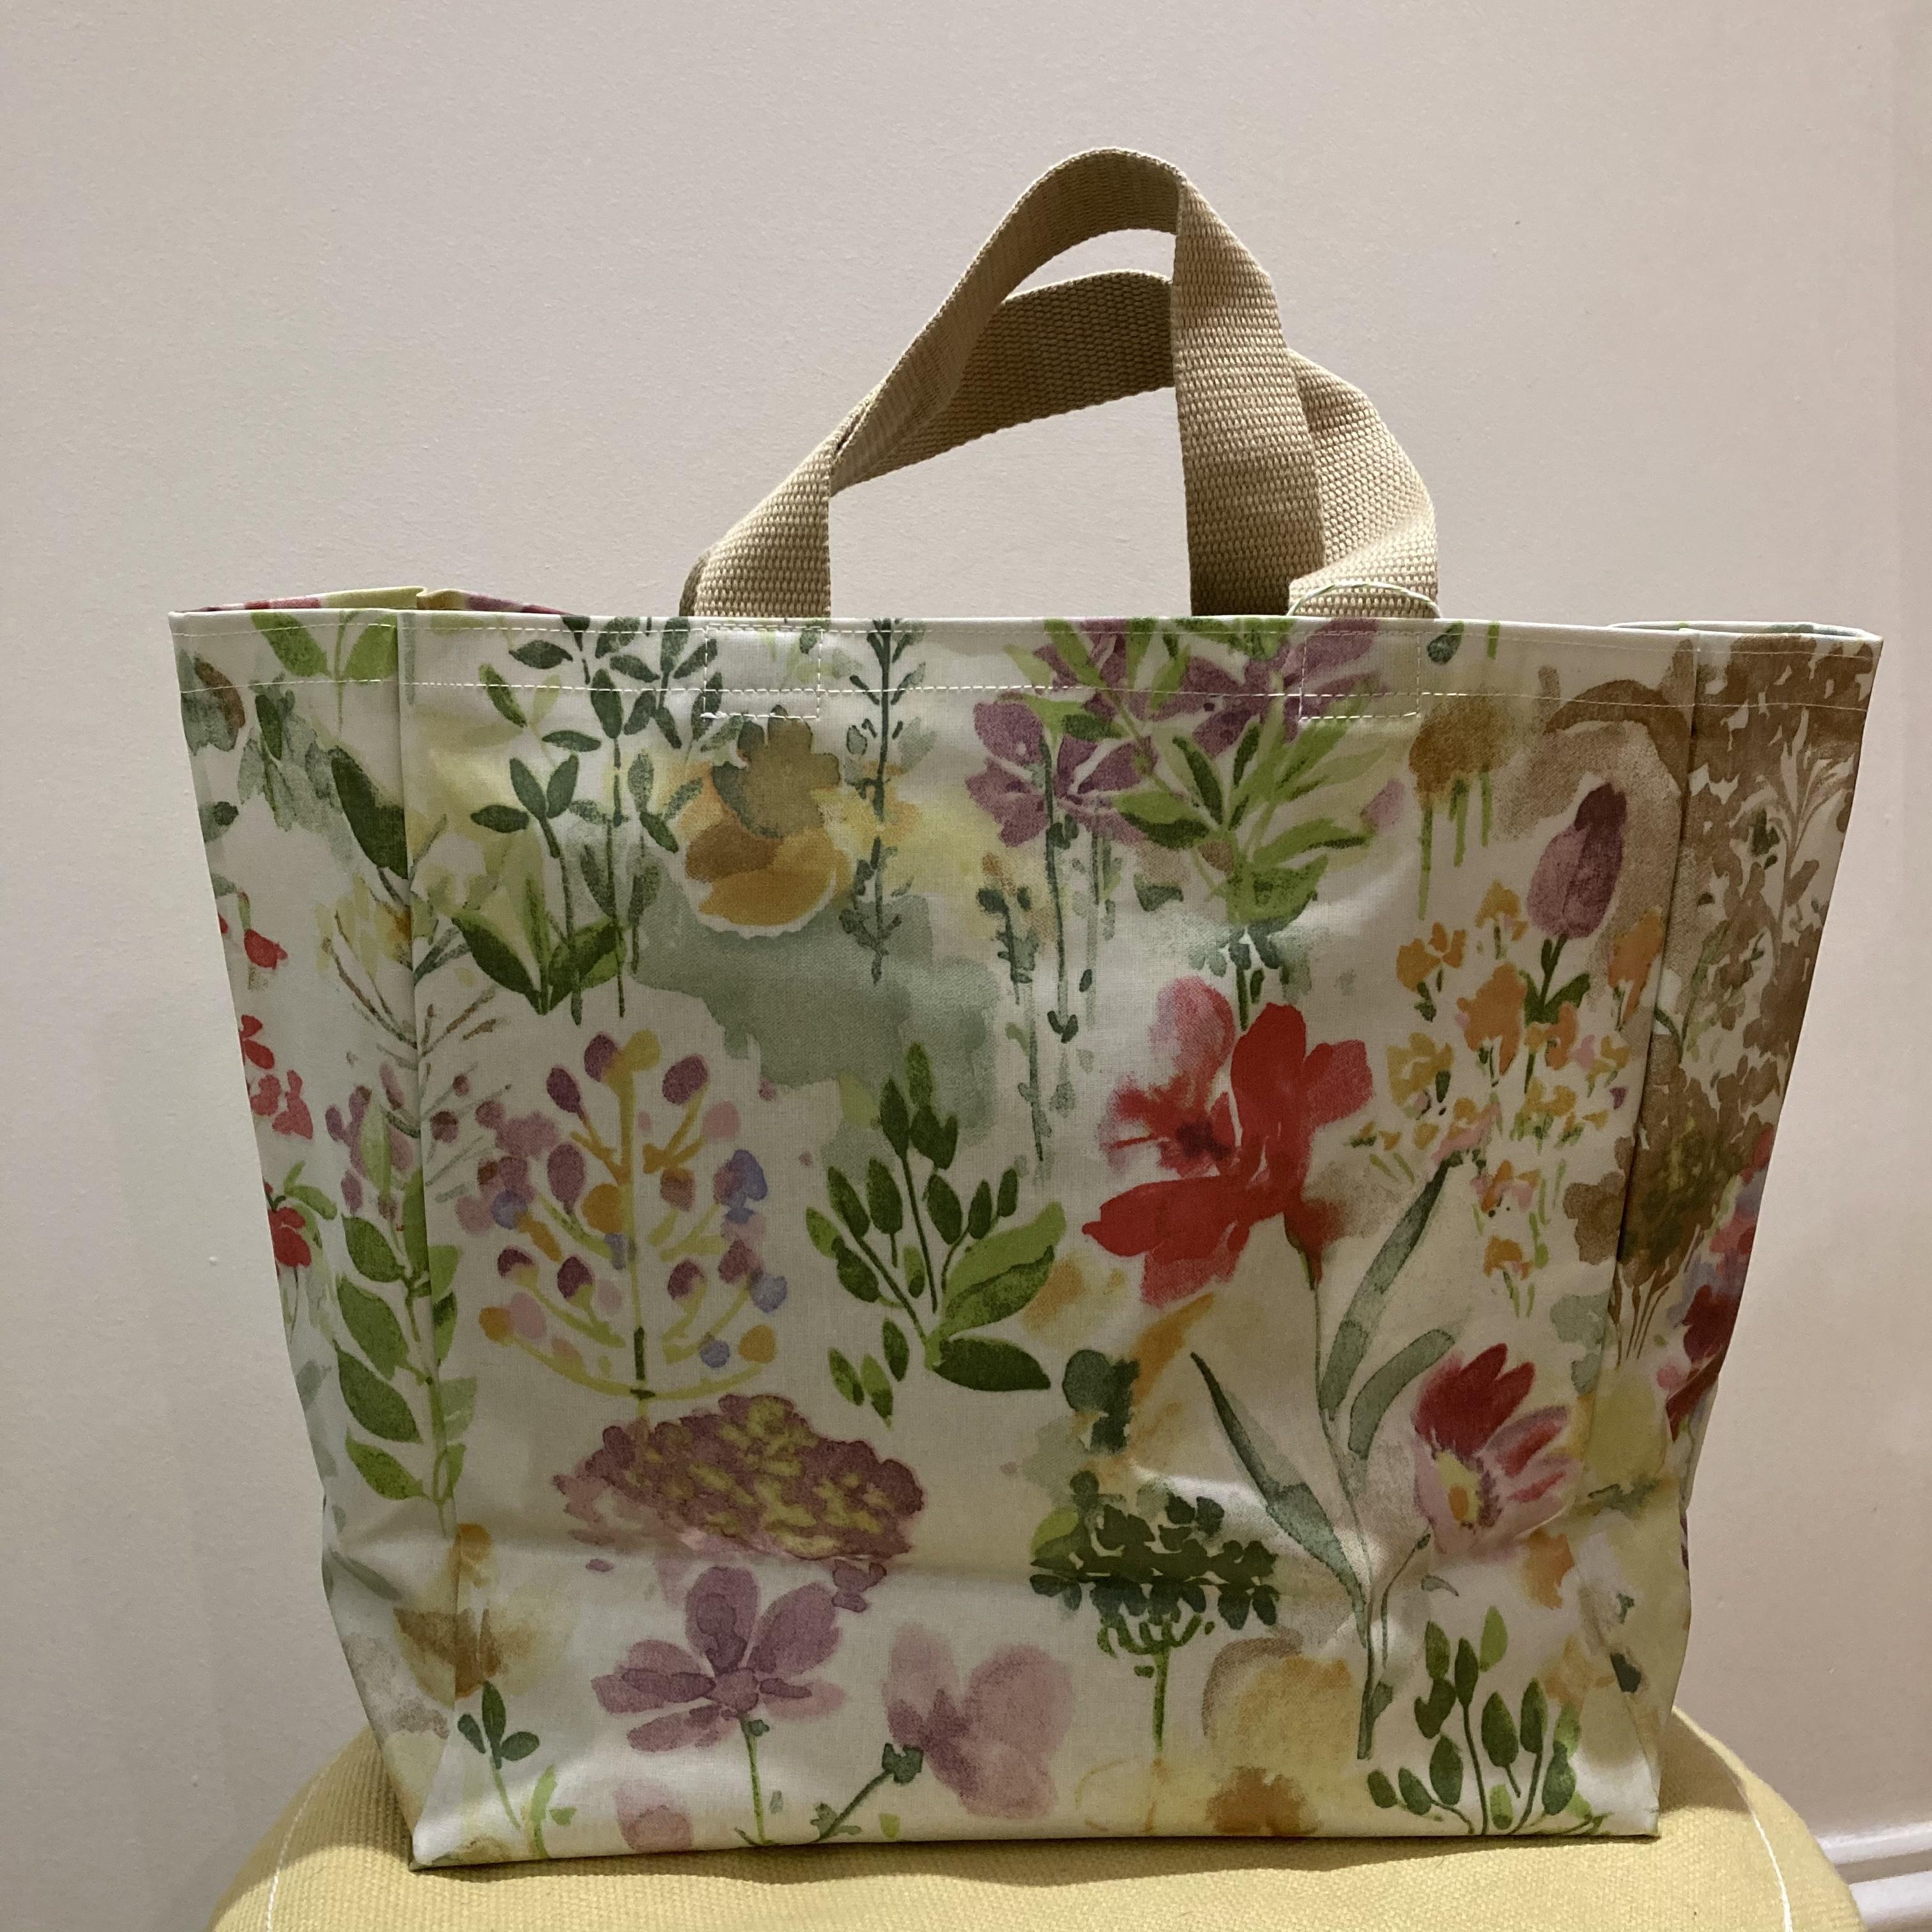 Floral print vinyl tote bag by Stella's Stichcraft